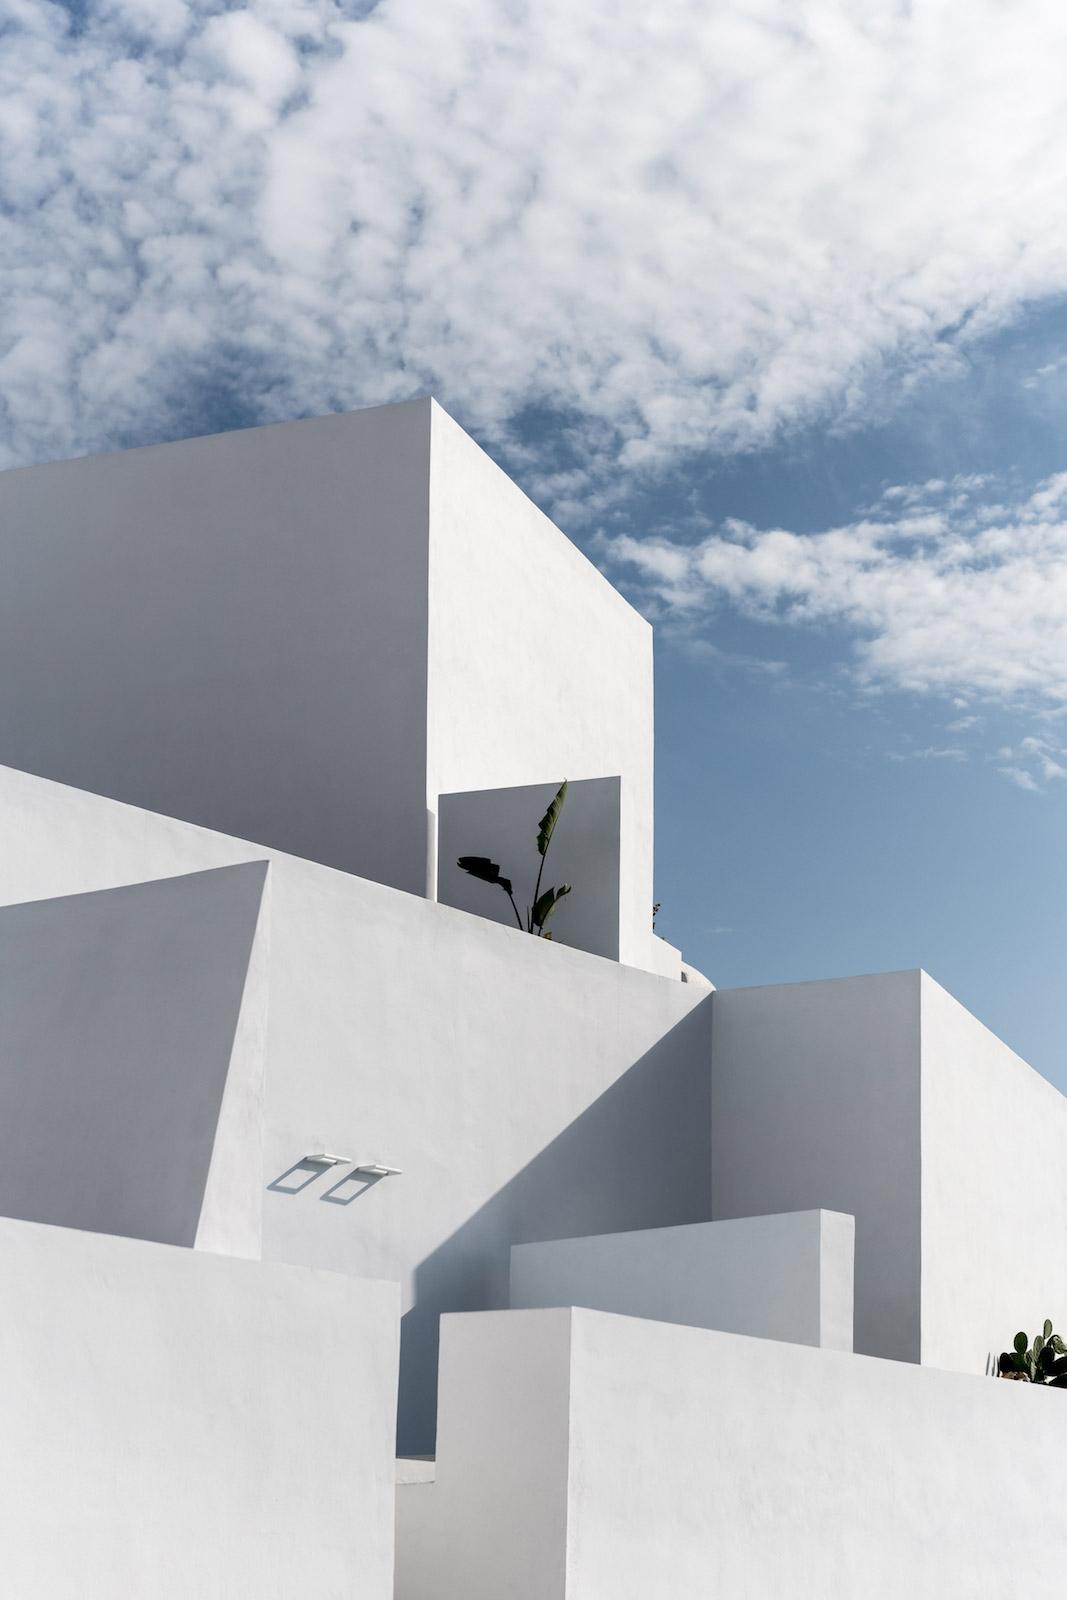 Saint Hotel Santorini, designed - minimalissimo | ello